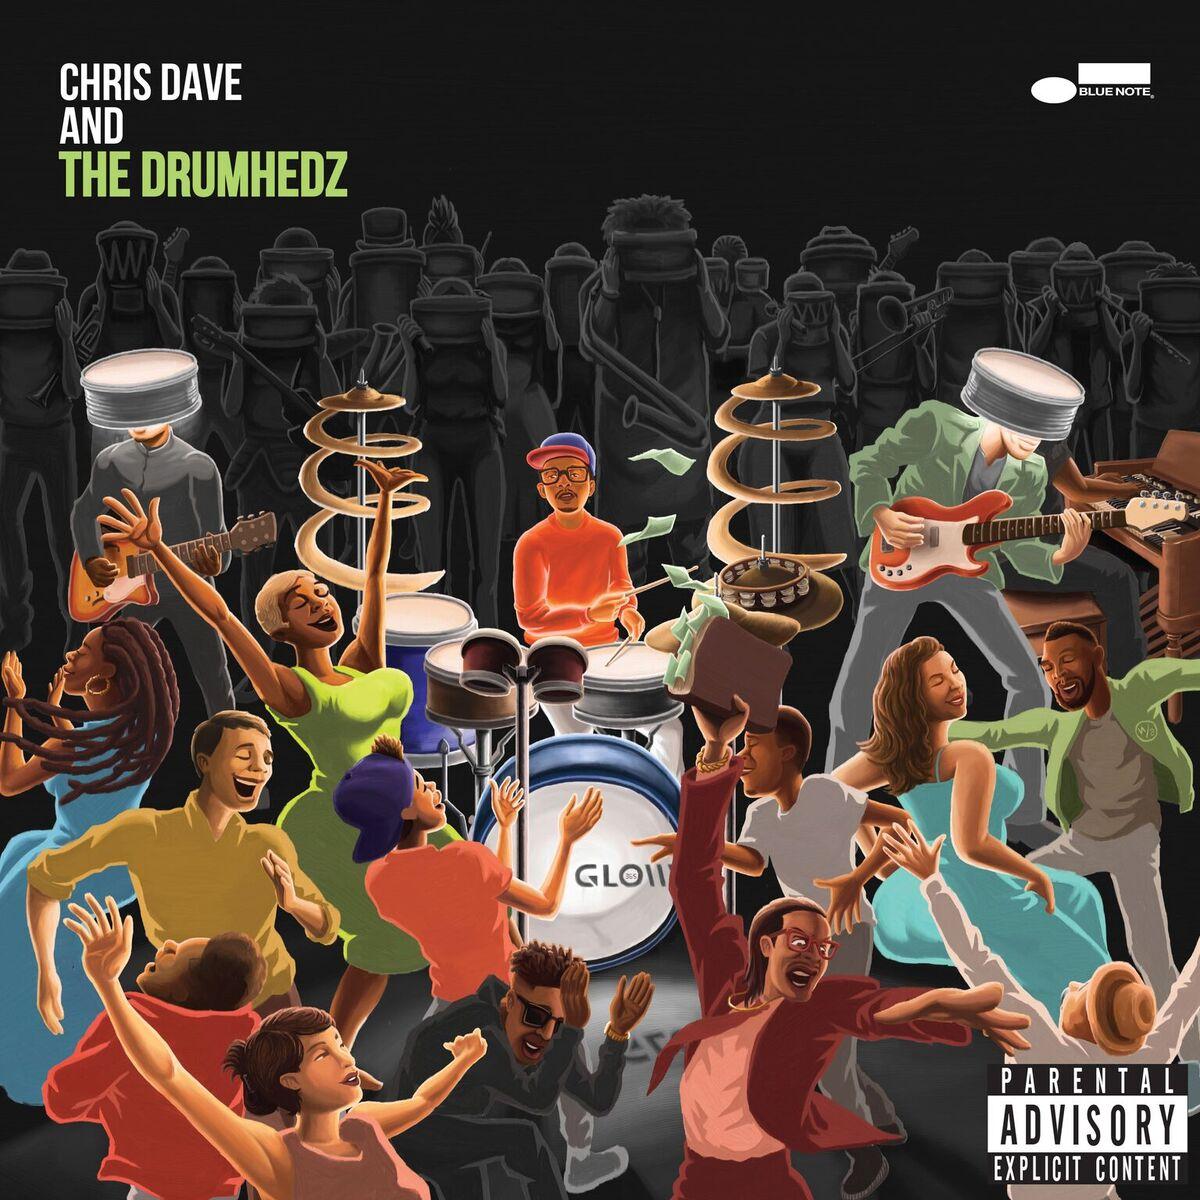 ChrisDave-Drumhedz-CoverExplicit_preview.jpg